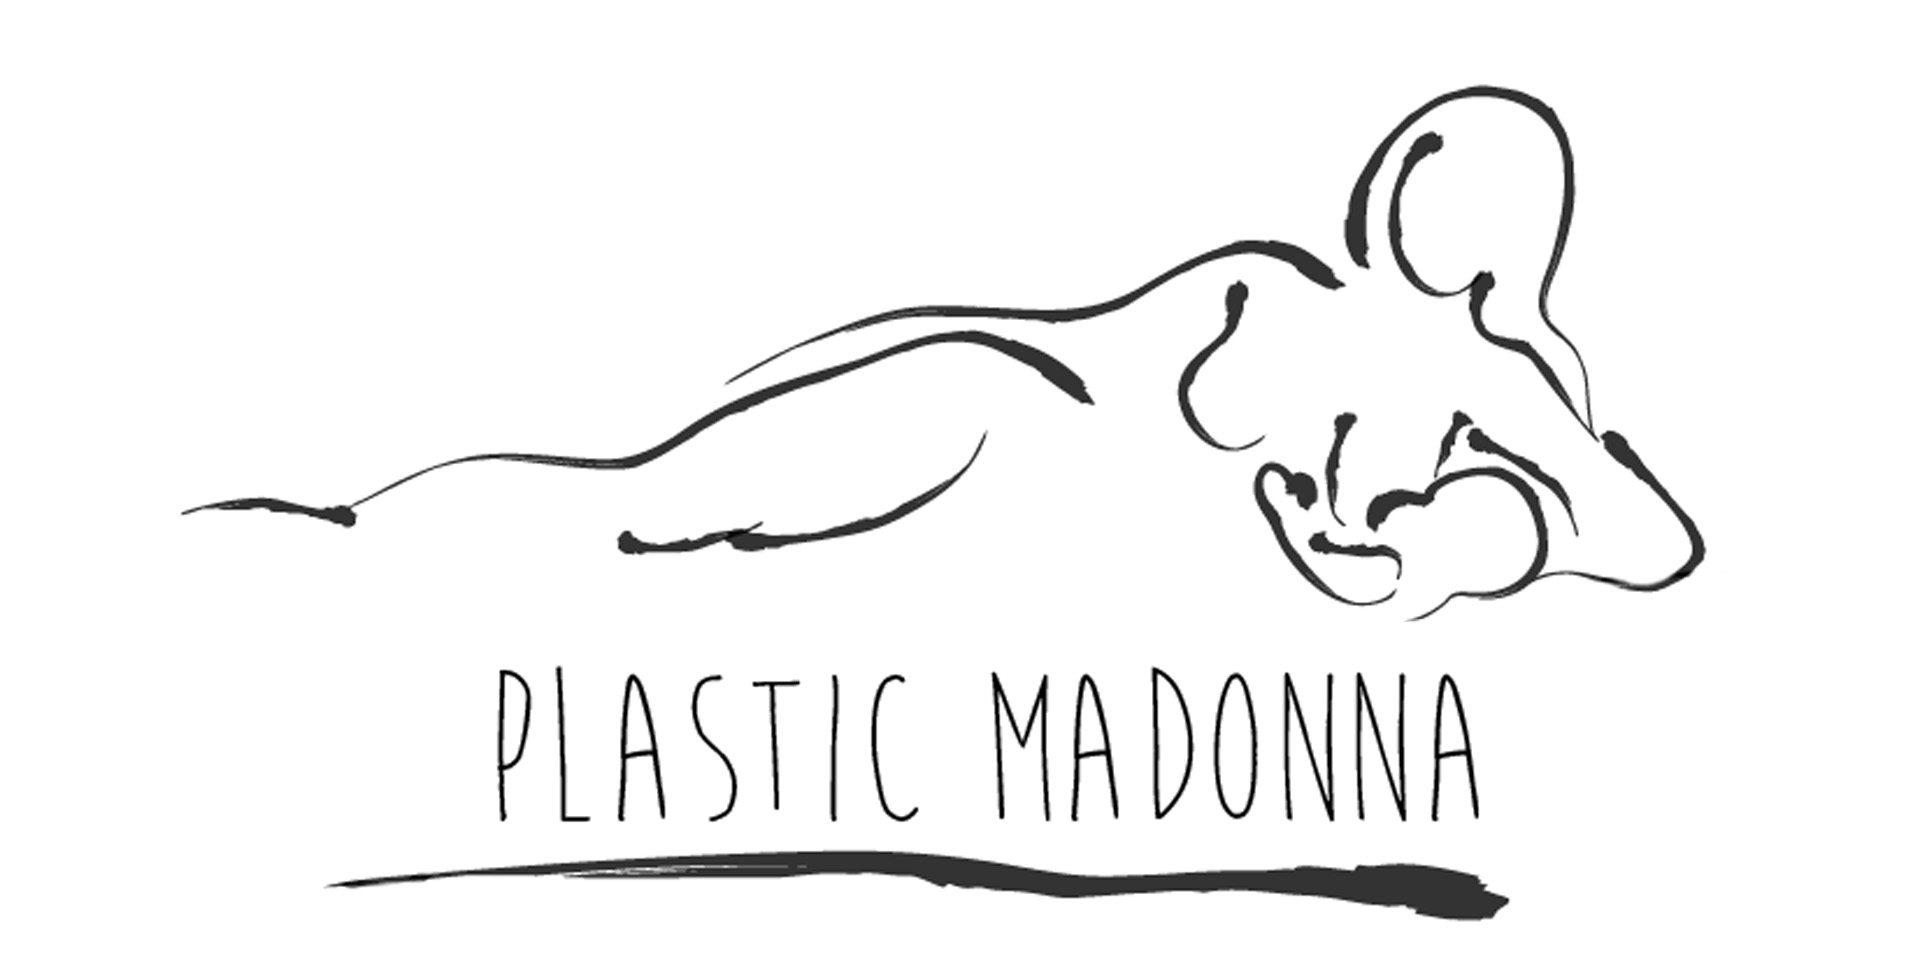 plastic-madonna-logo-bldschrm1